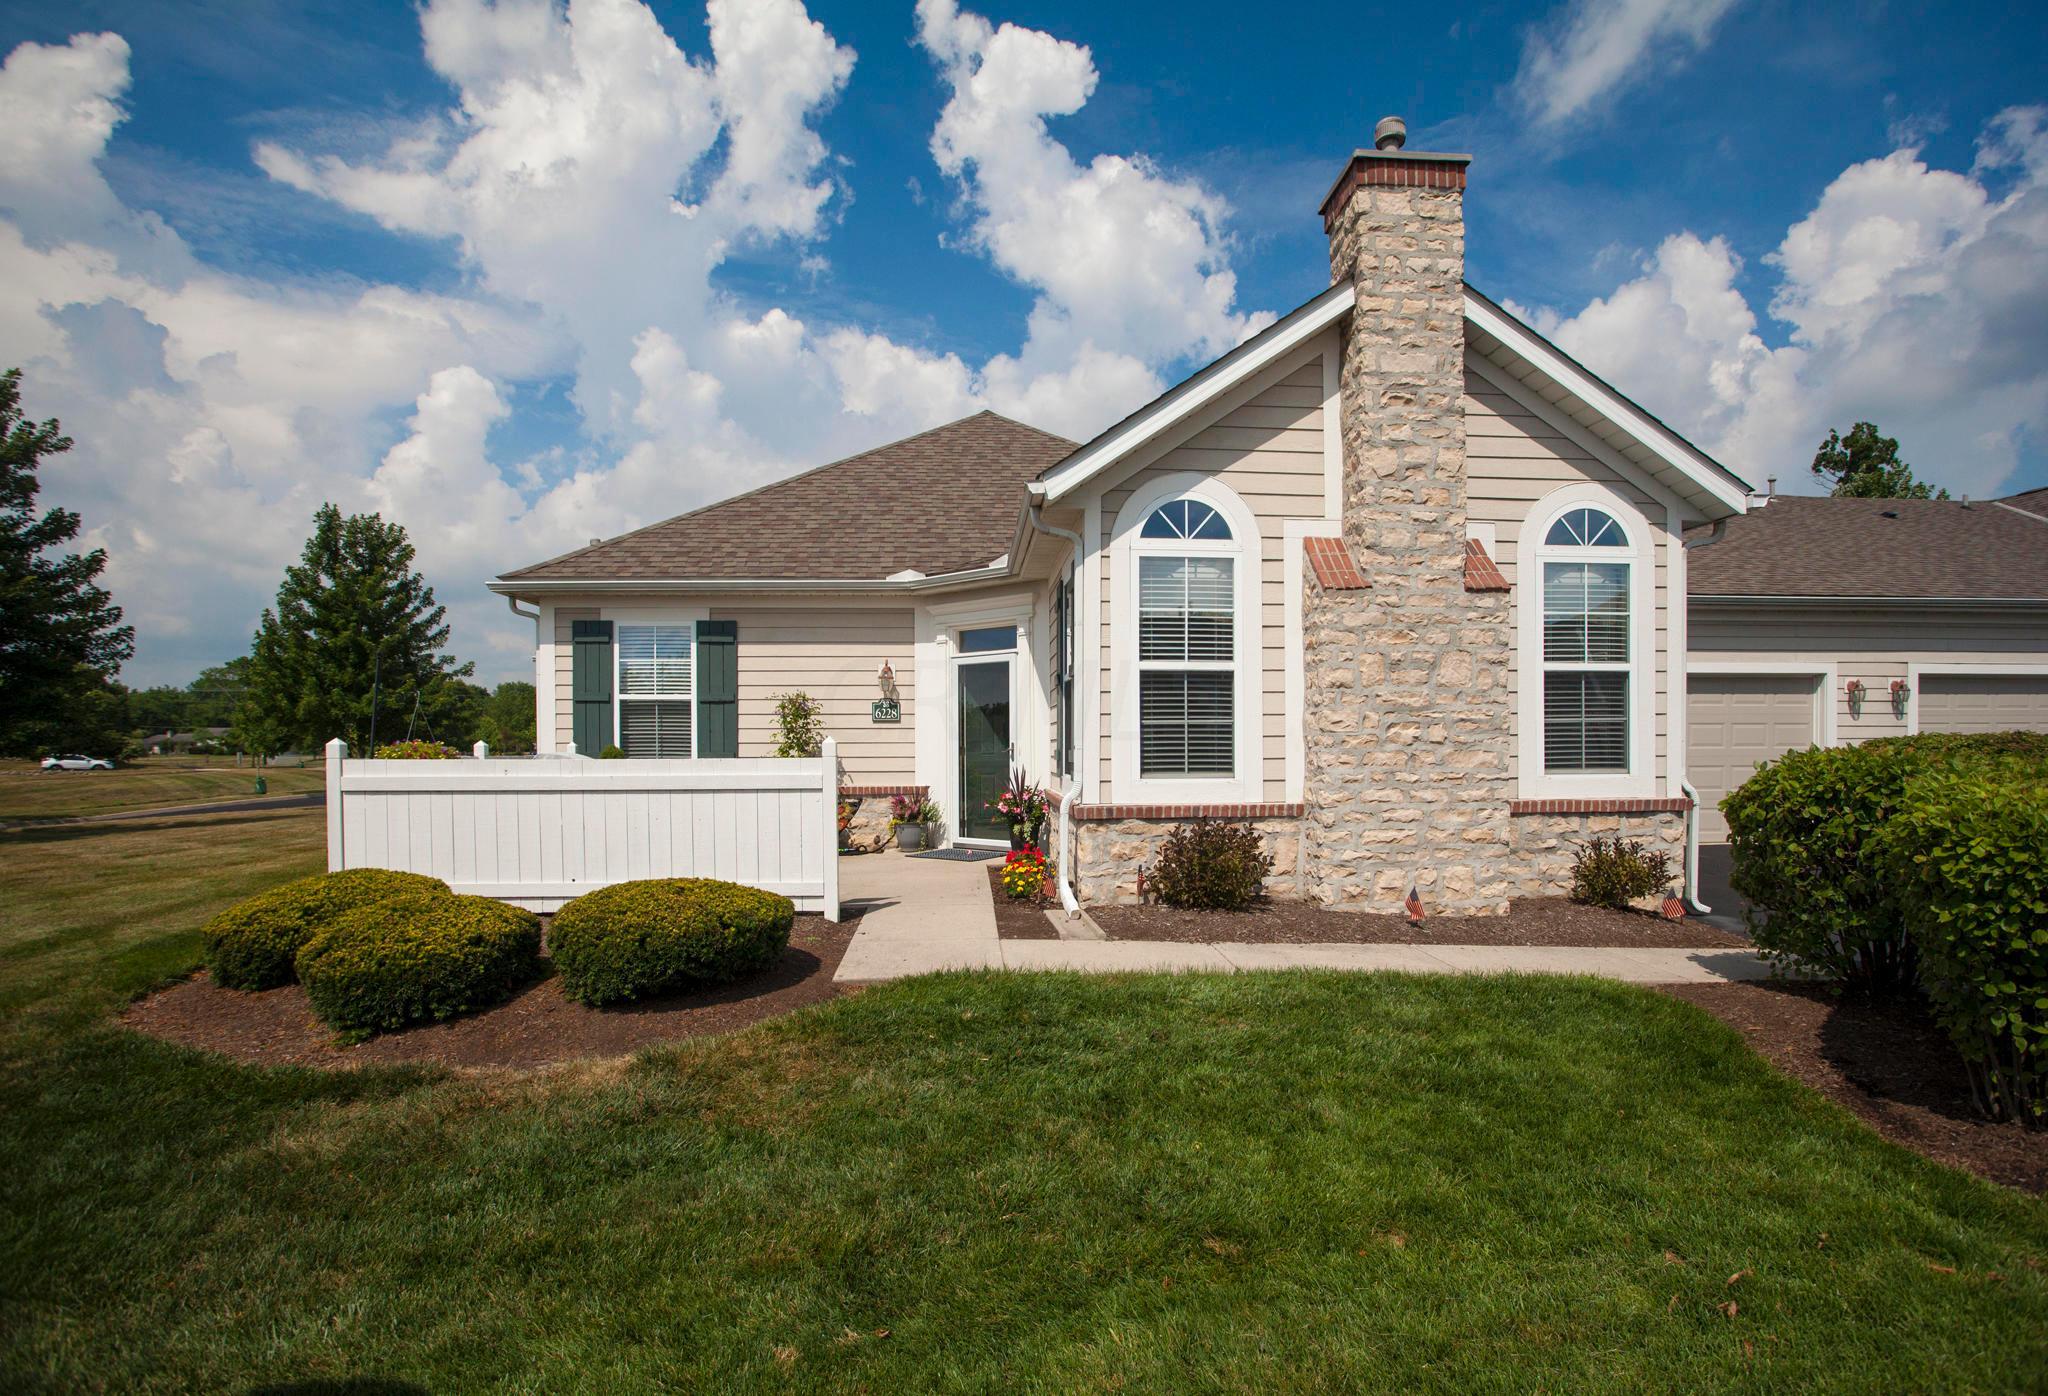 6228 Ardmore Way, Dublin, Ohio 43016, 2 Bedrooms Bedrooms, ,2 BathroomsBathrooms,Residential,For Sale,Ardmore,220022734